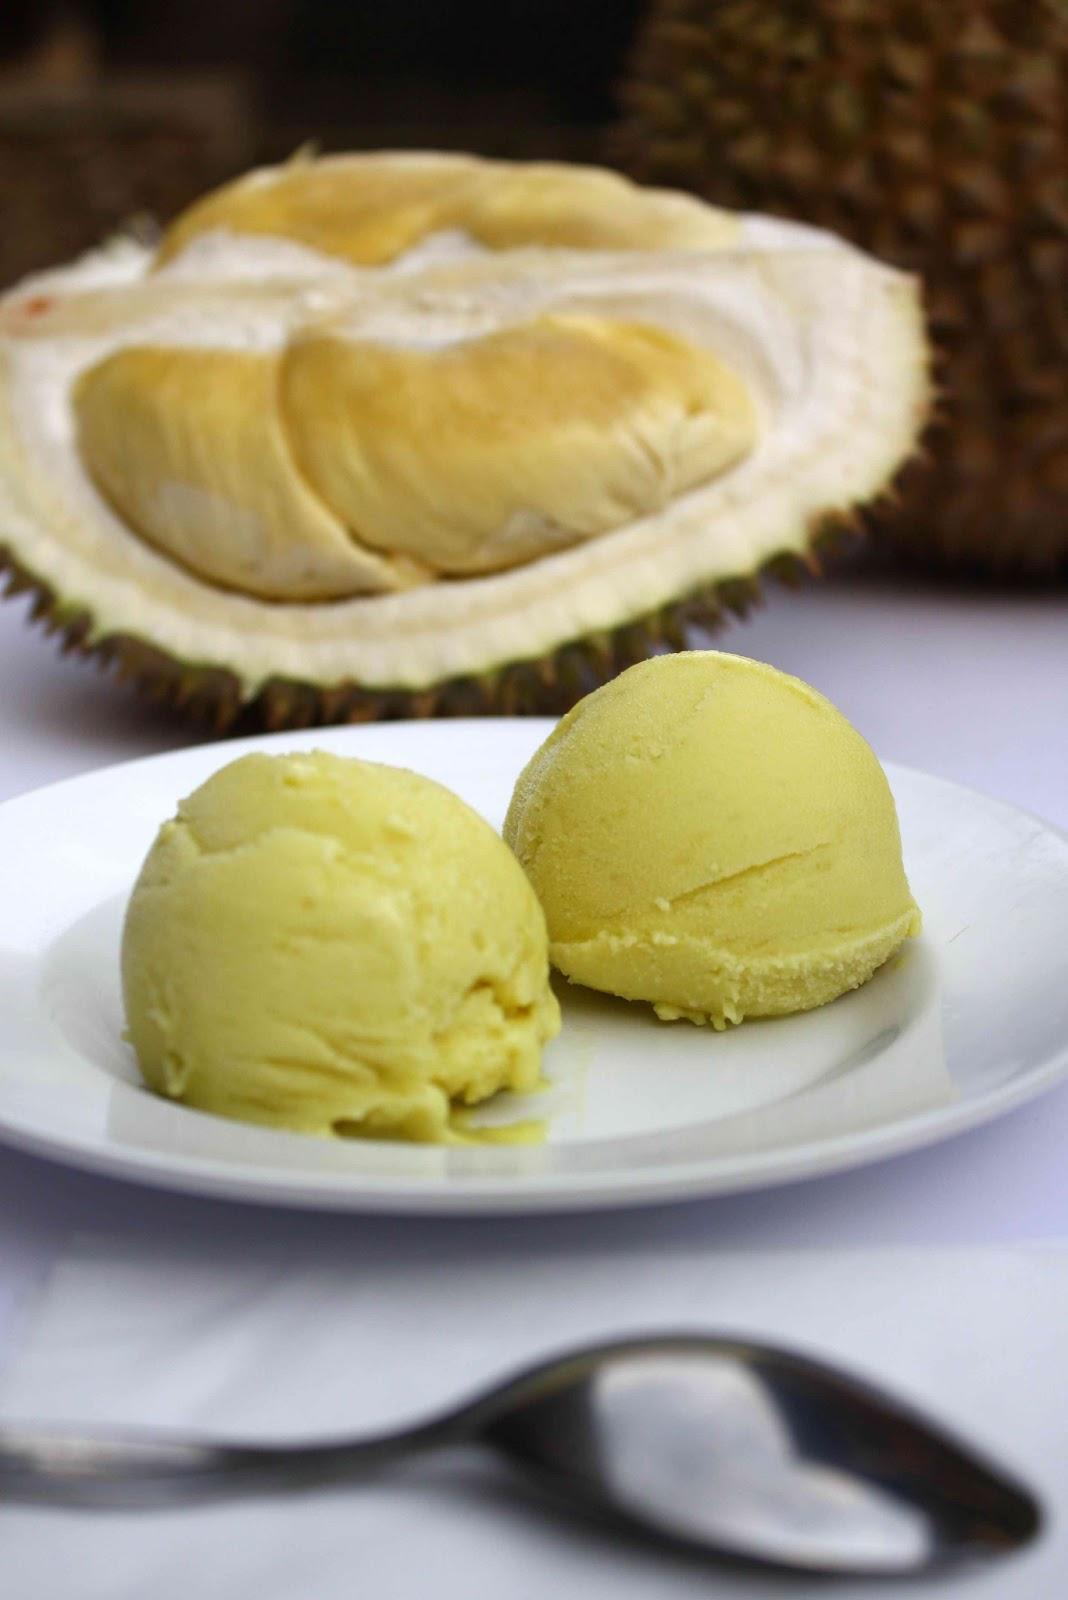 Durian Ice Cream Cake